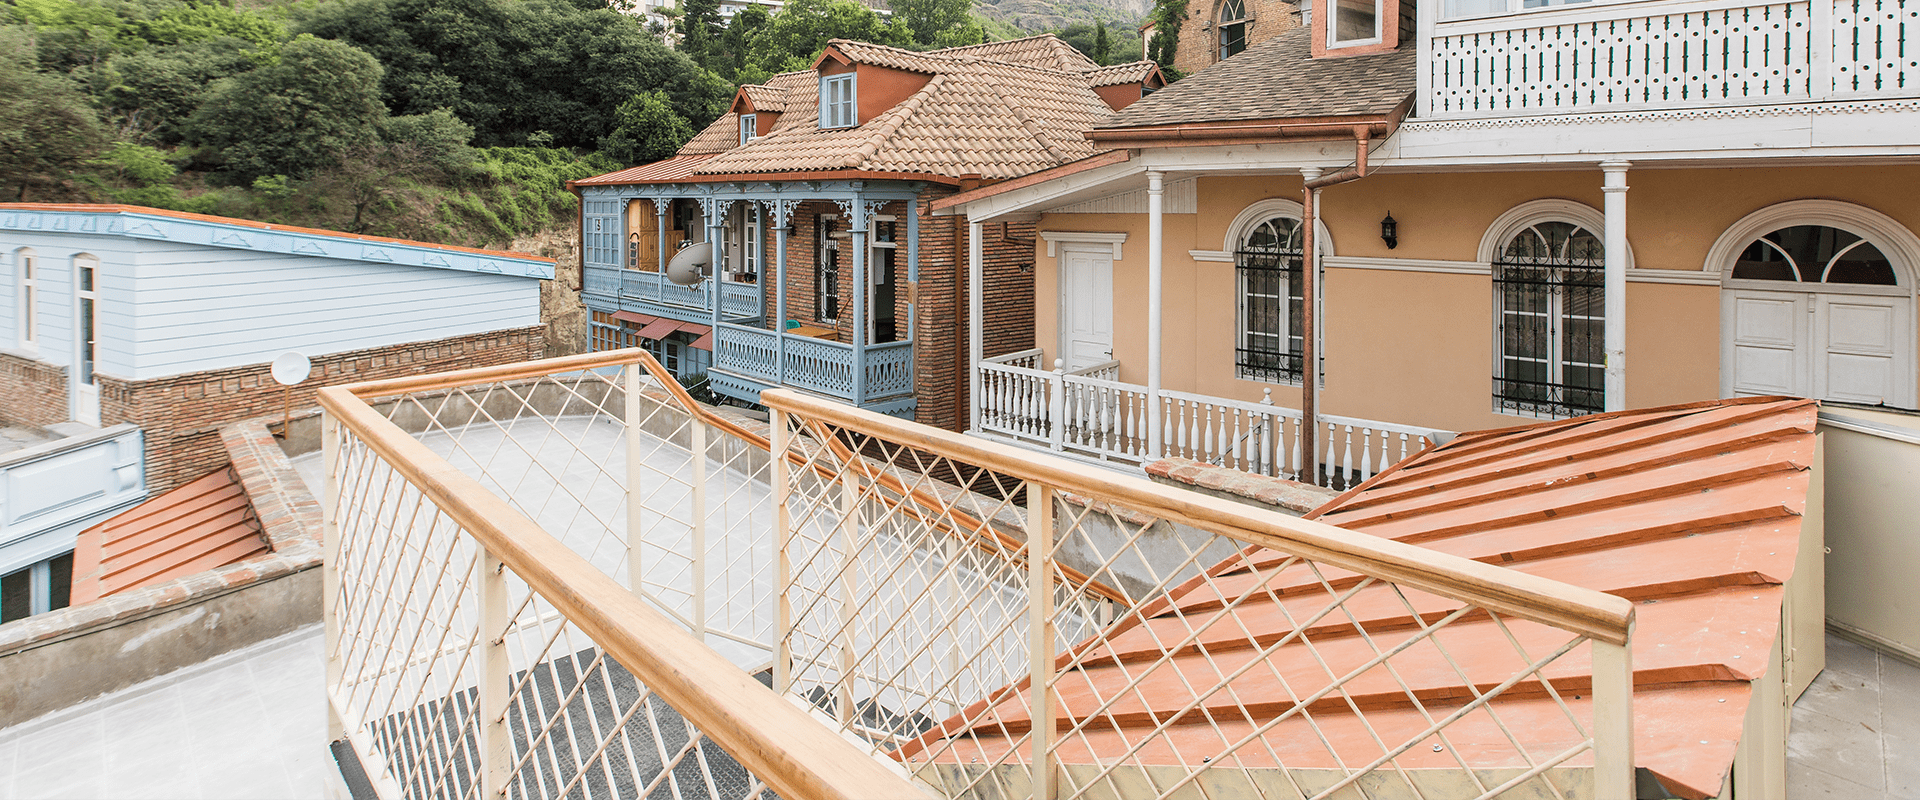 boutique hotel in tbilisi city center